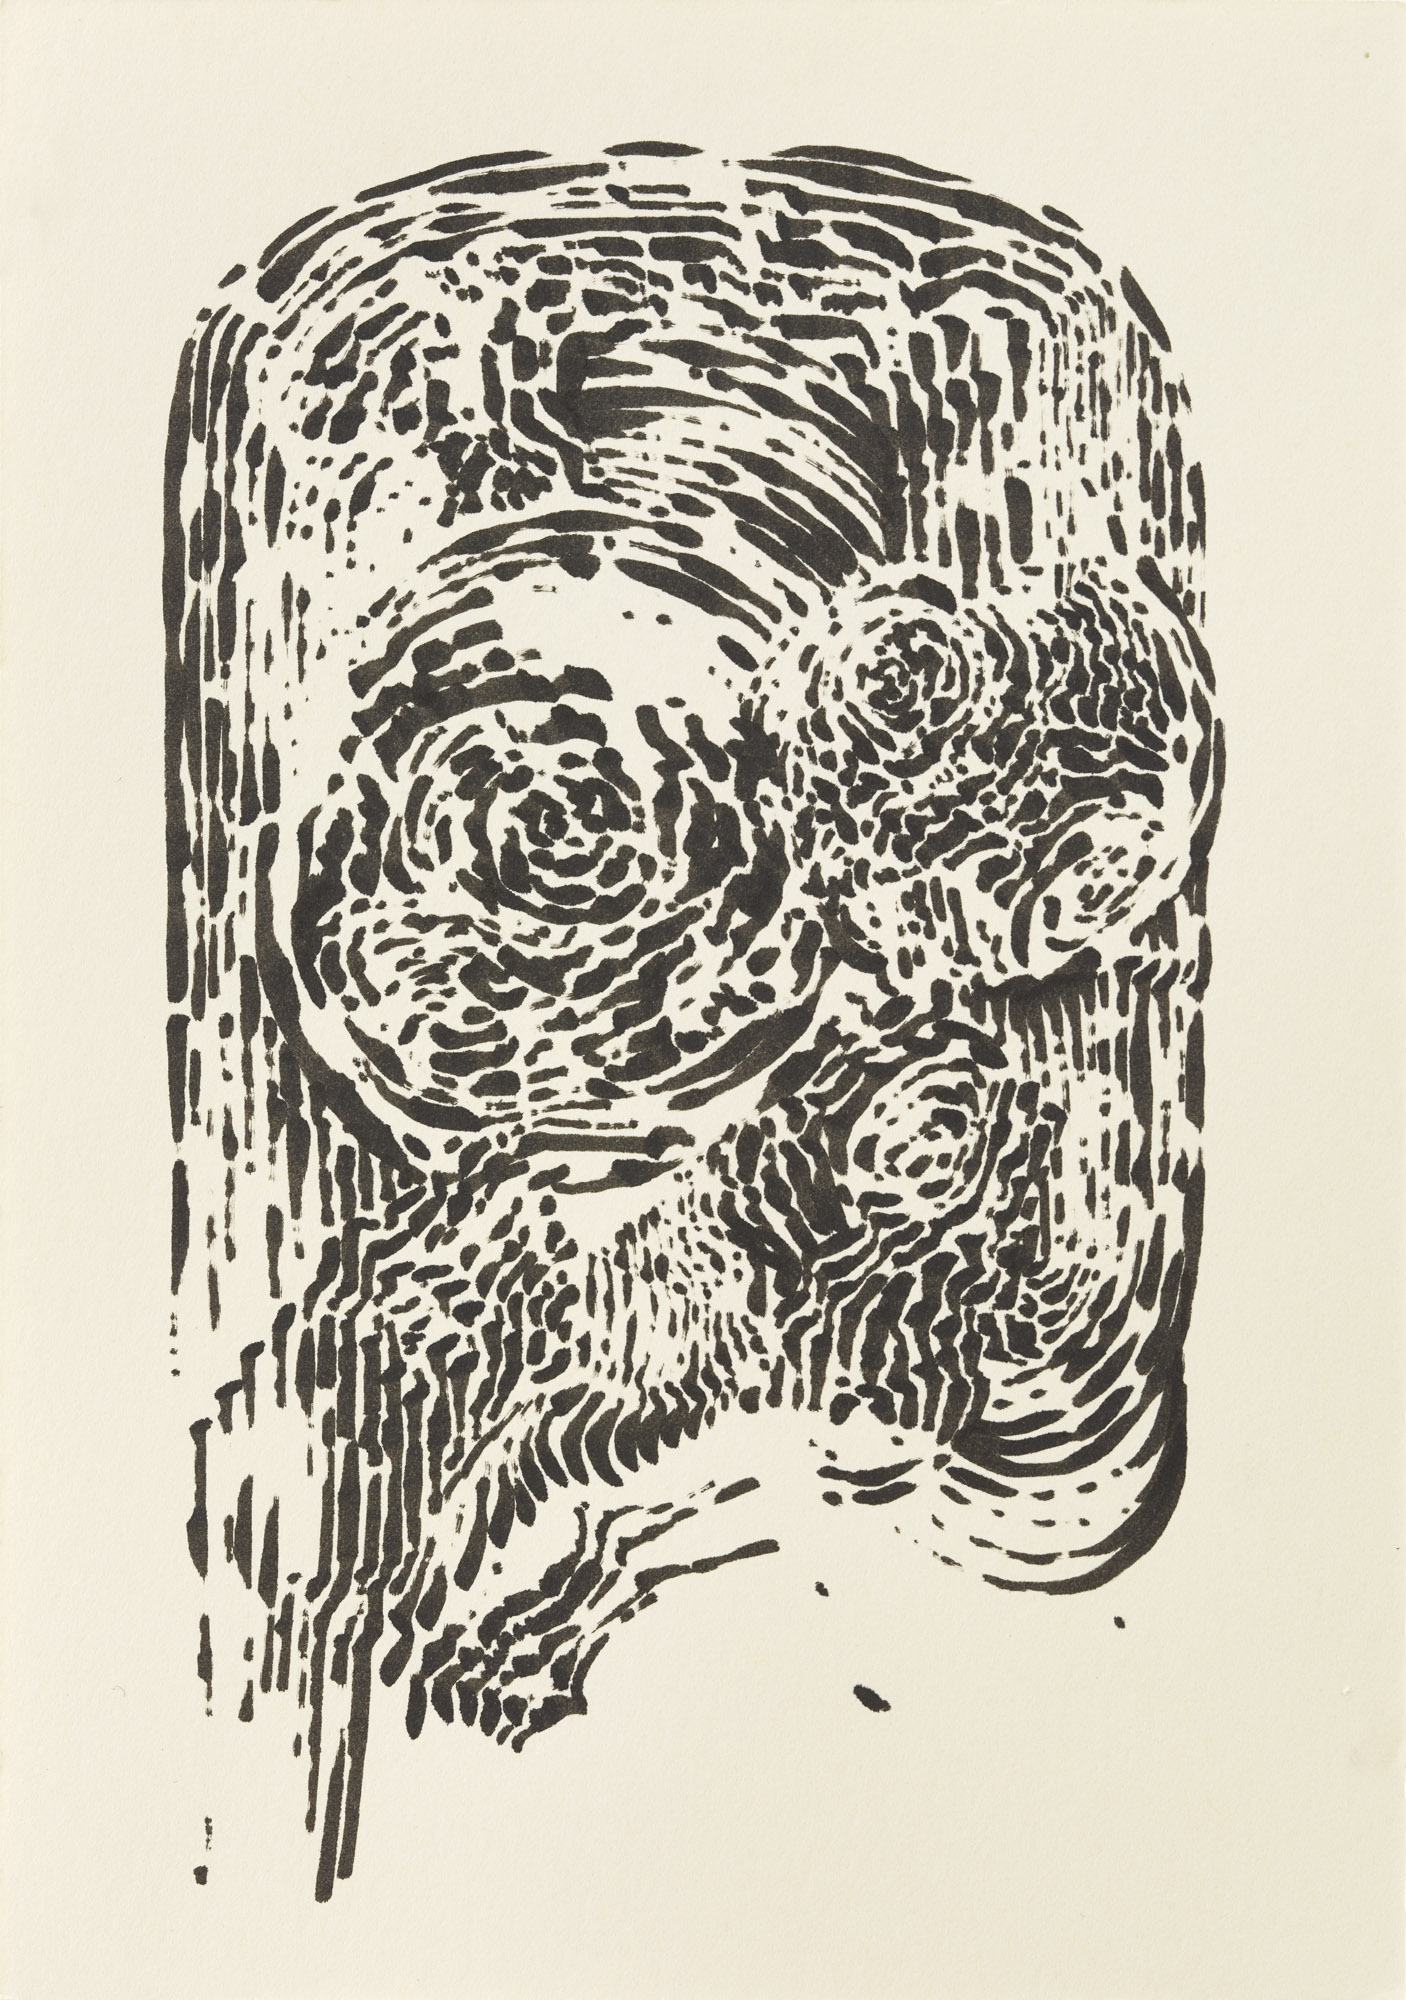 BK P7533 | untitled | ink on paper | 21x15cm | 2015